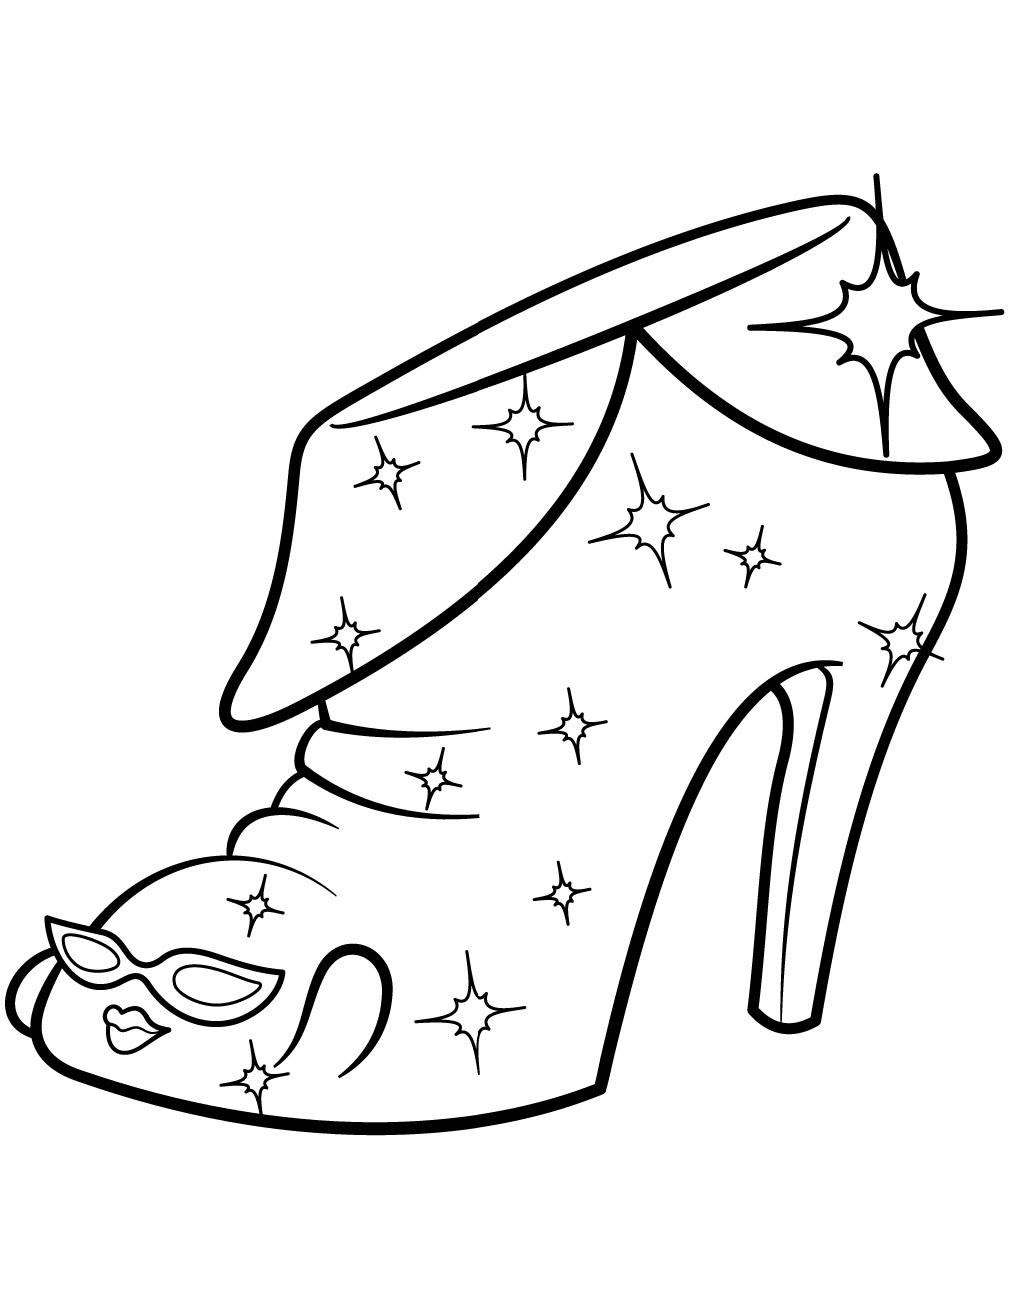 Angie Ankle Boot Shopkin Season 2